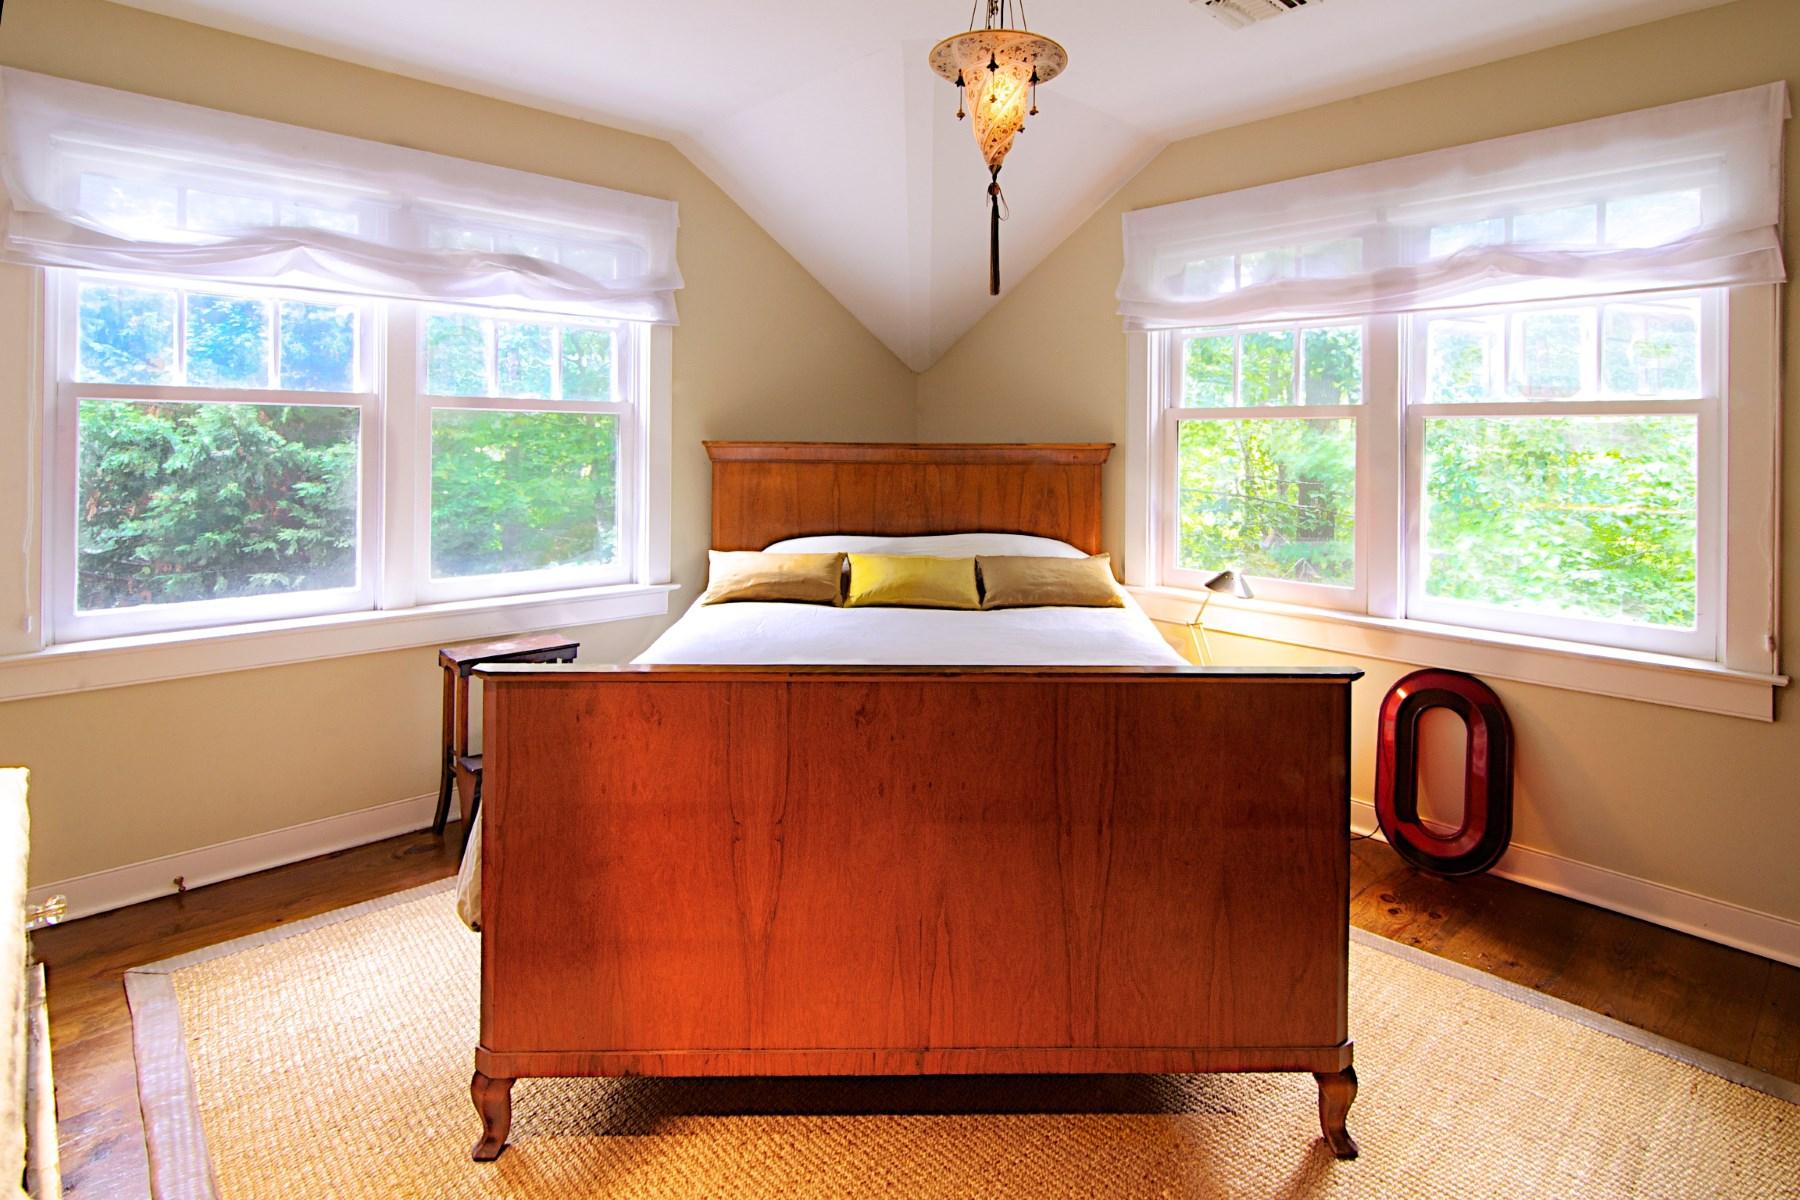 Additional photo for property listing at PEACEFUL AMAGANSETT TRADITIONAL  Amagansett, New York 11930 United States